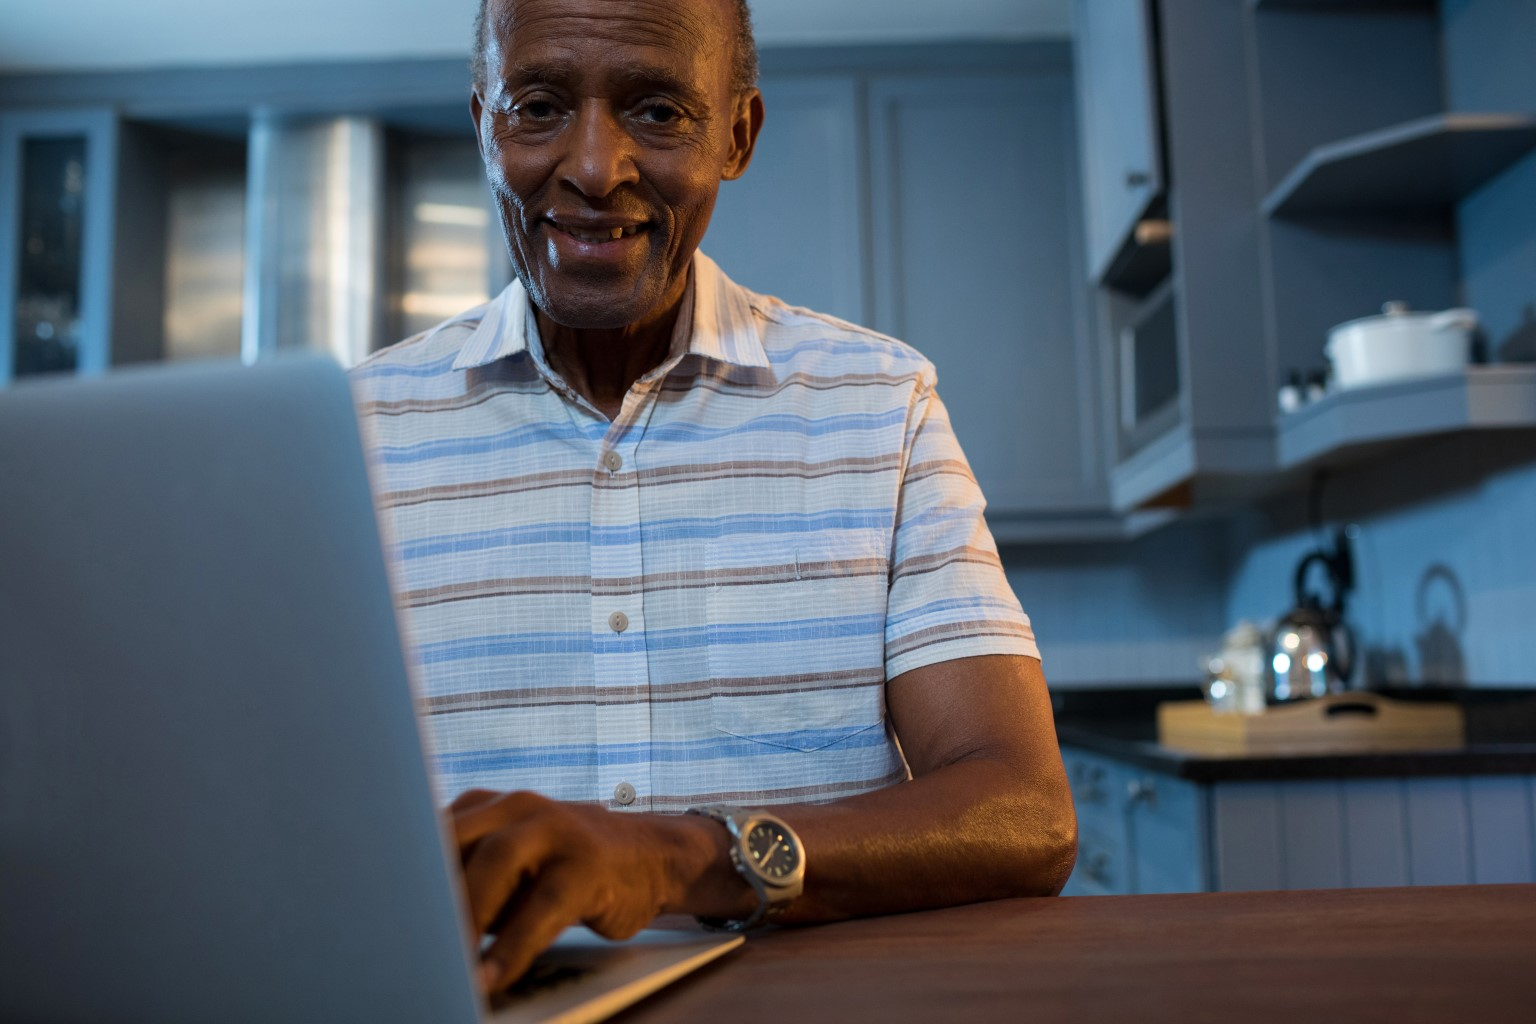 Elderly gentleman consulting a doctor via telehealth